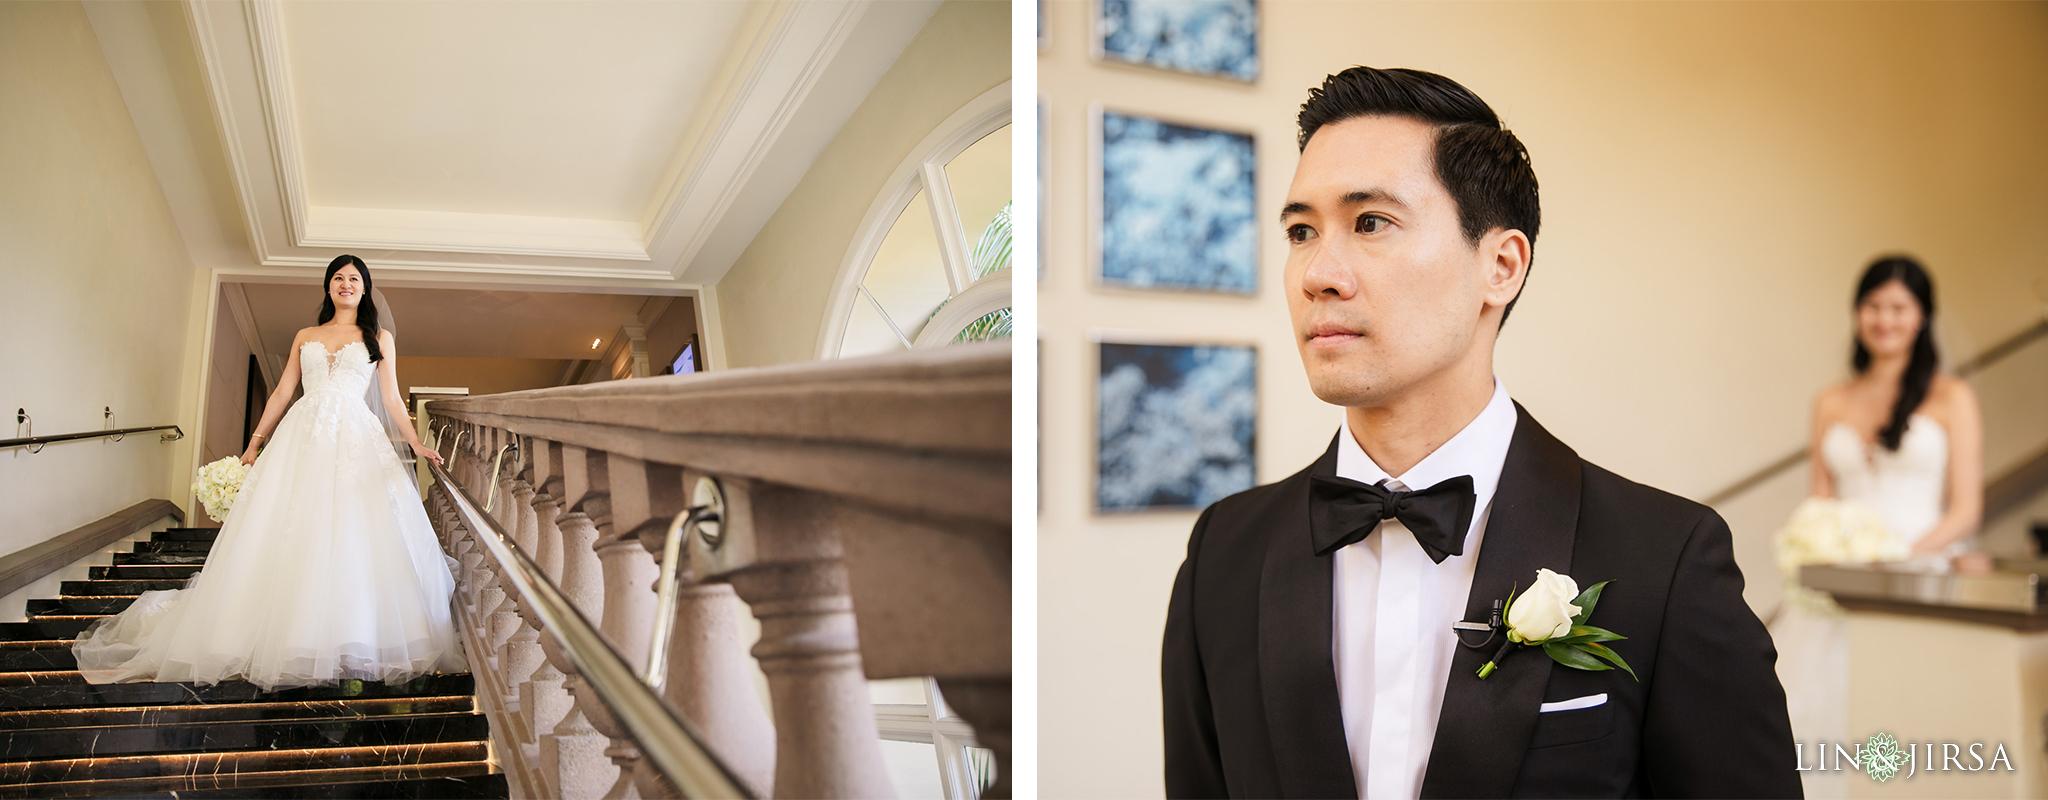 11 Ritz Carlton Laguna Niguel Wedding Photography